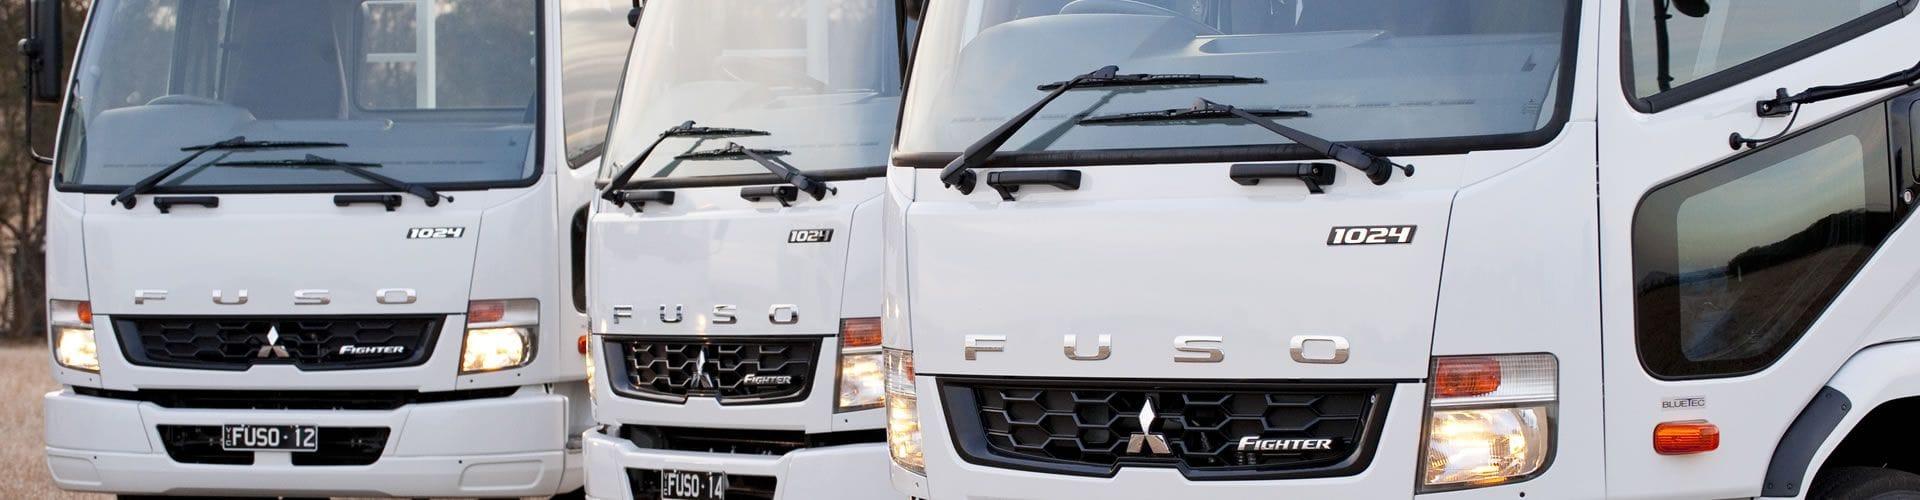 FUSO Fighter | Daimler Trucks Wagga & Albury